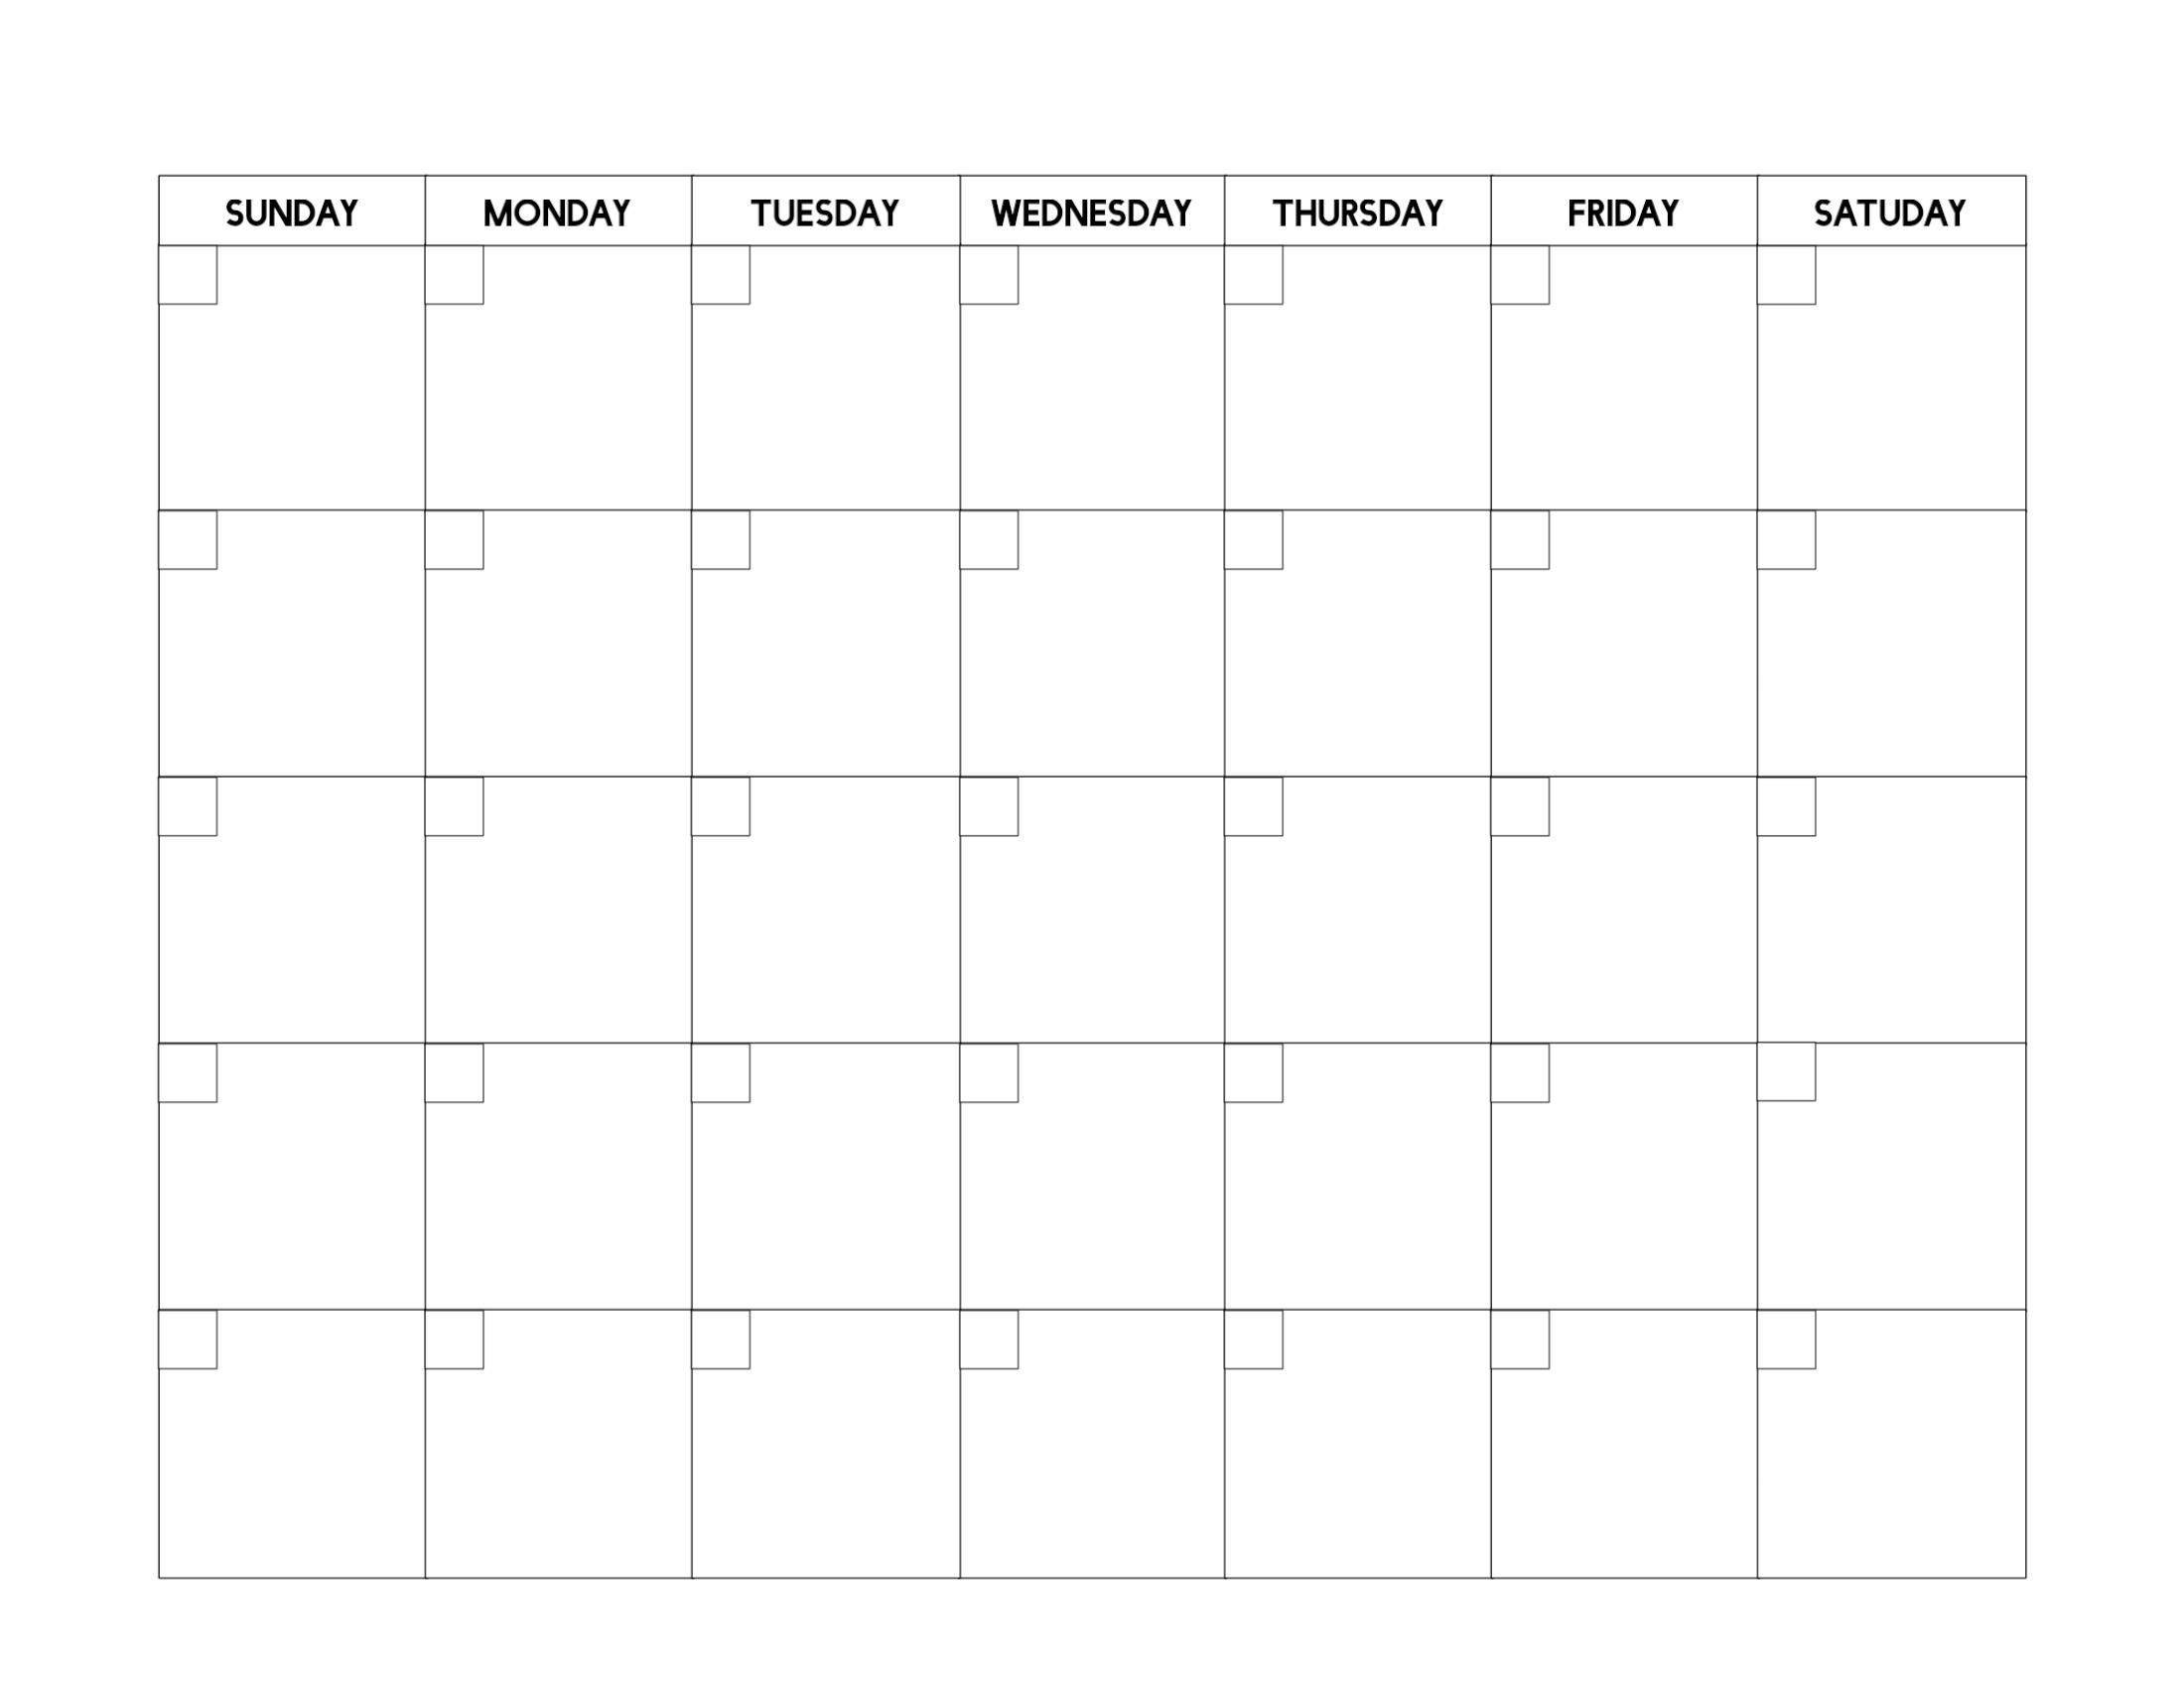 Free Printable Blank Calendar Template - Paper Trail Design regarding Blank Calendar Template With Lines